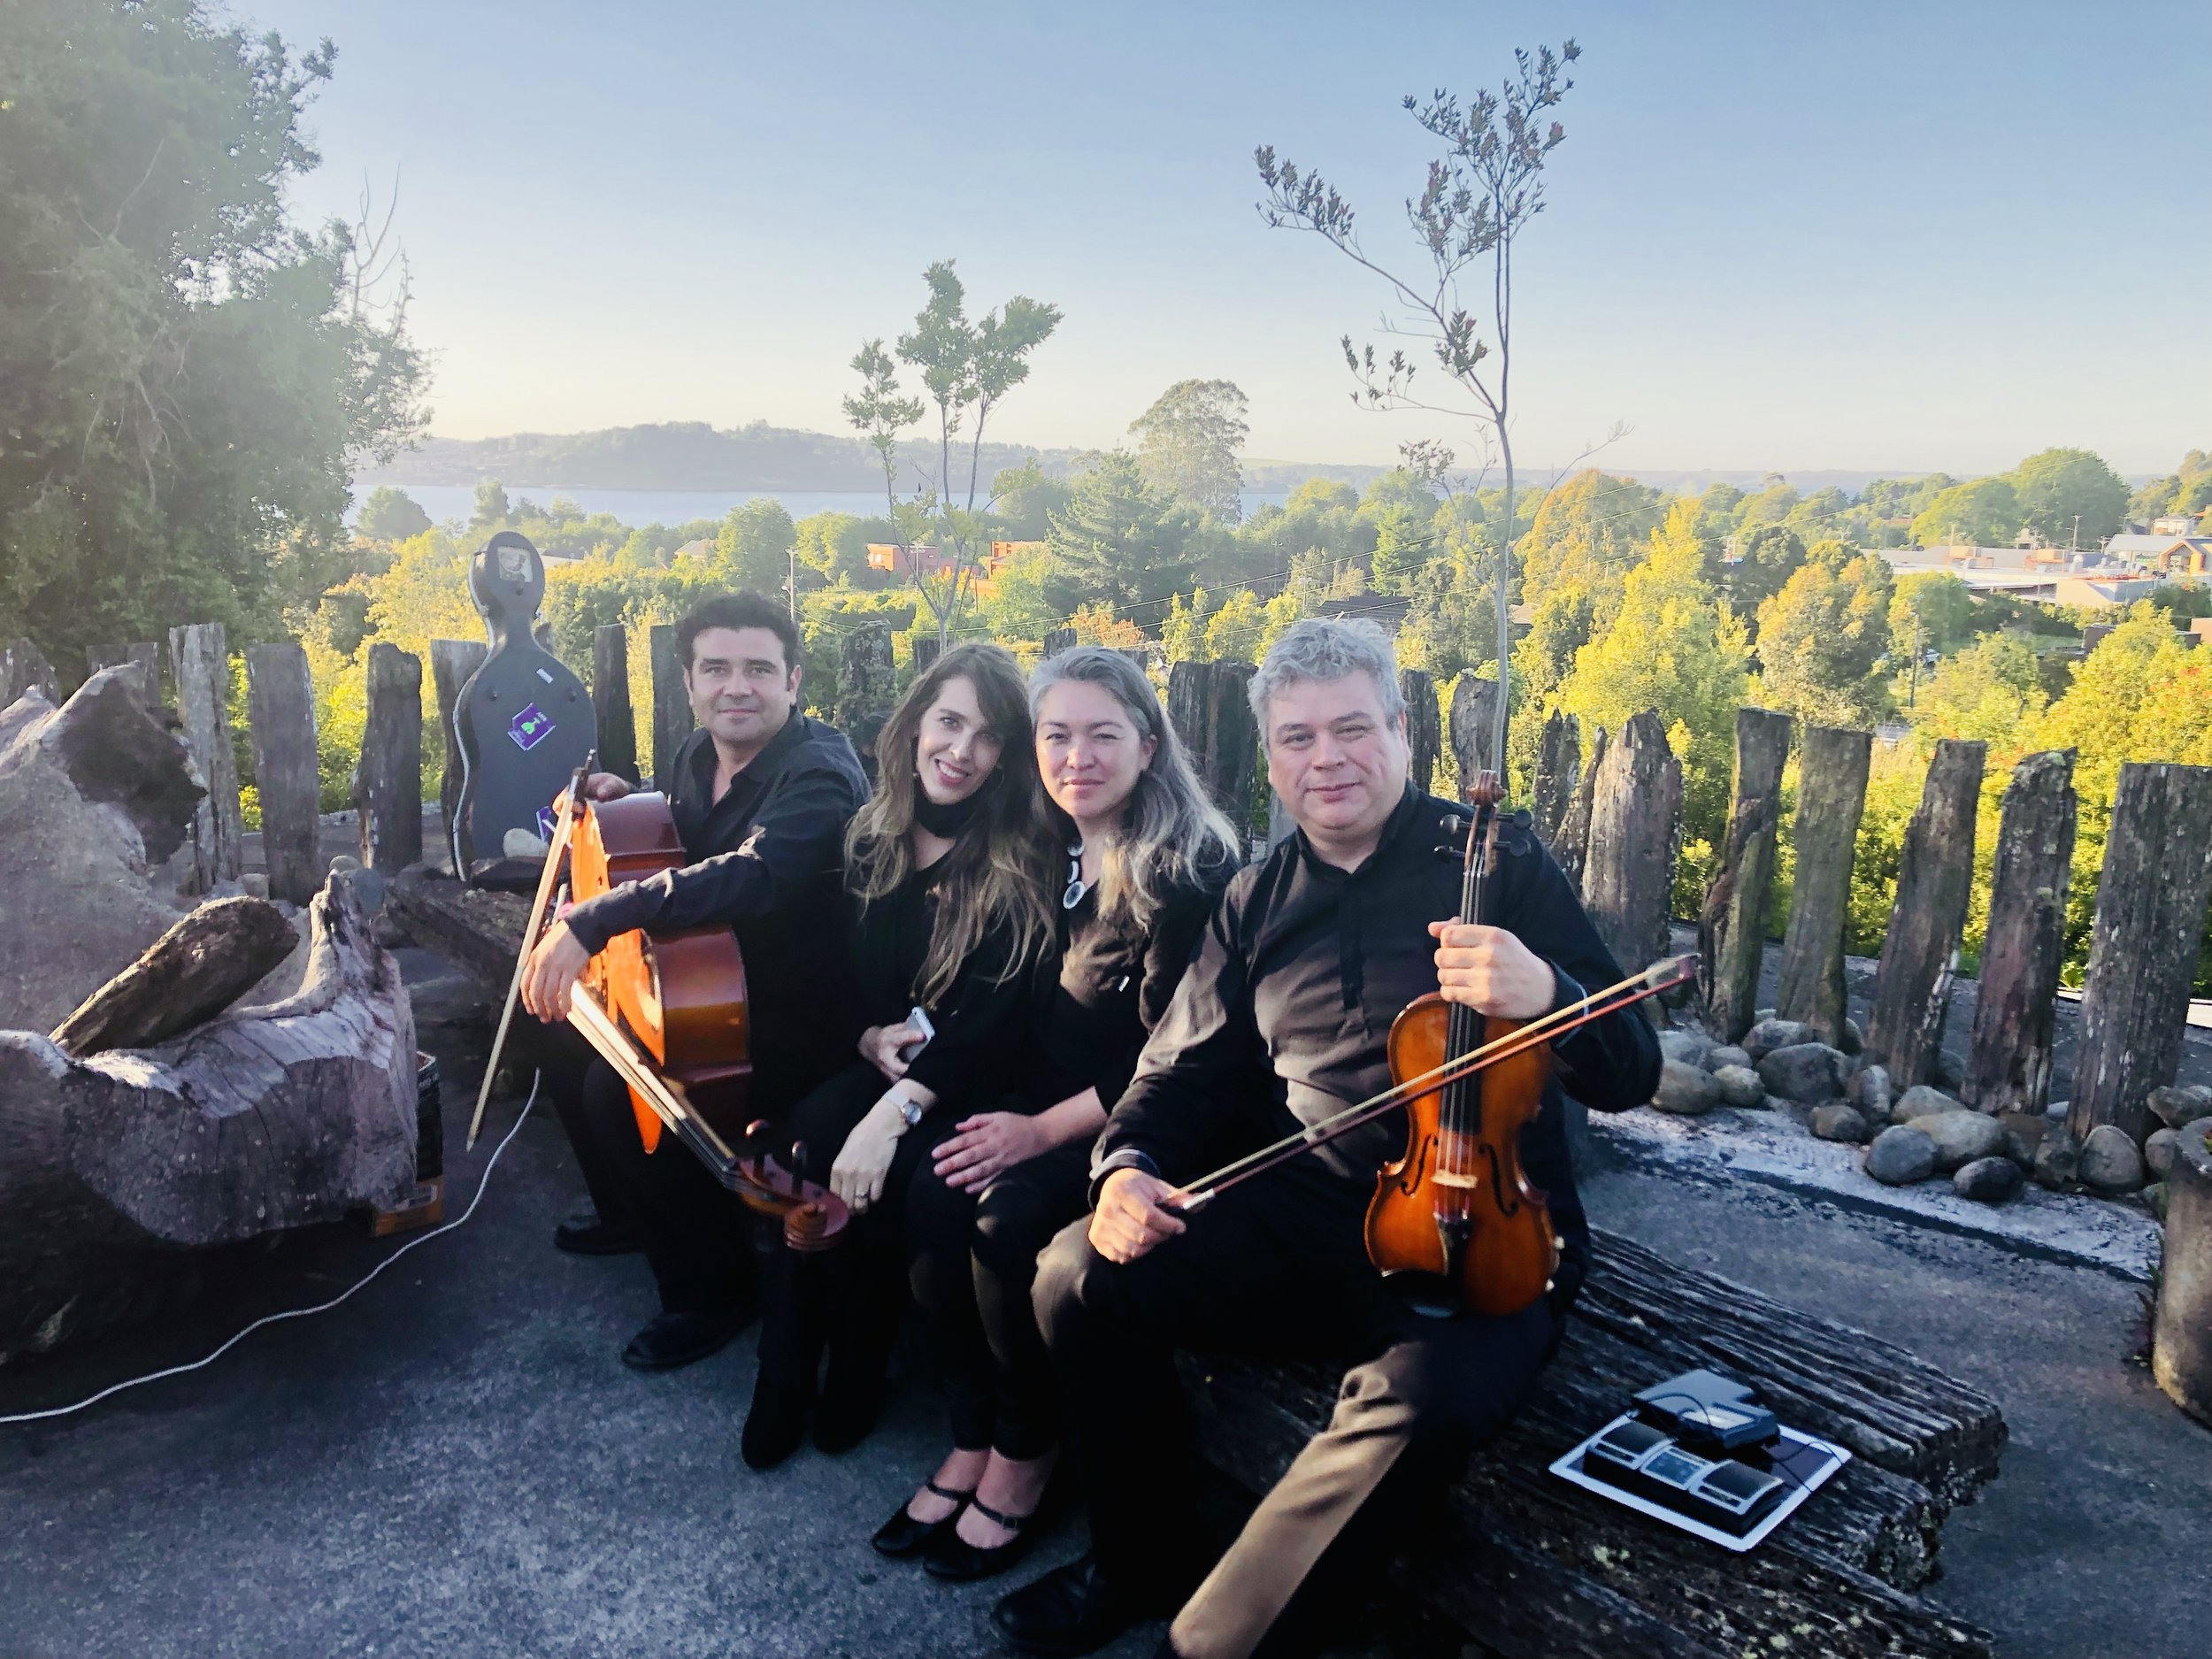 Musicos para matrimonios y eventos, Puerto Varas Chile